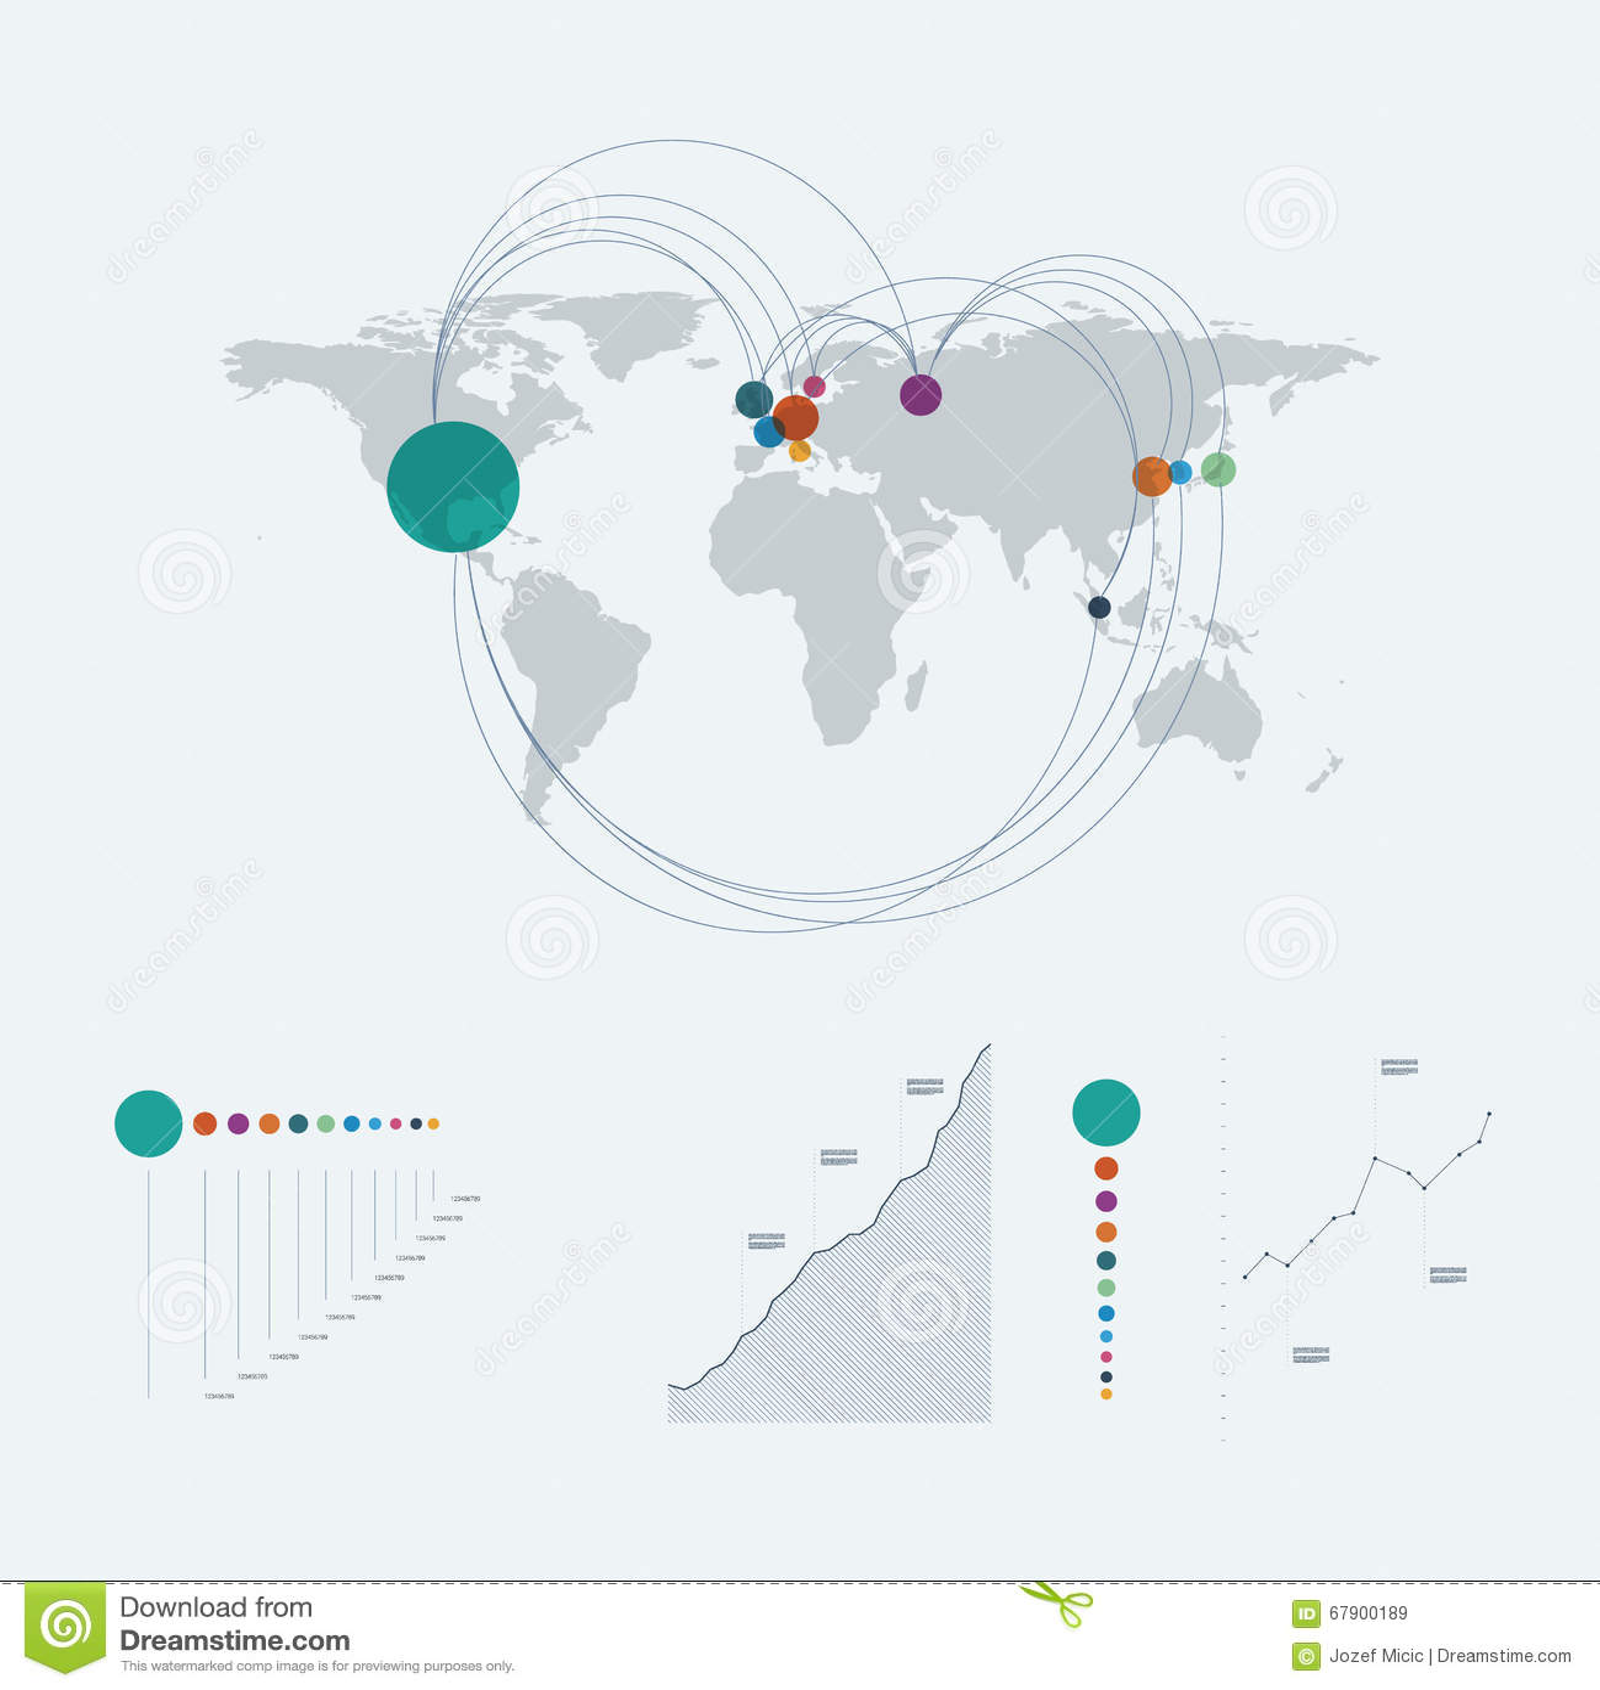 world map presentation templates